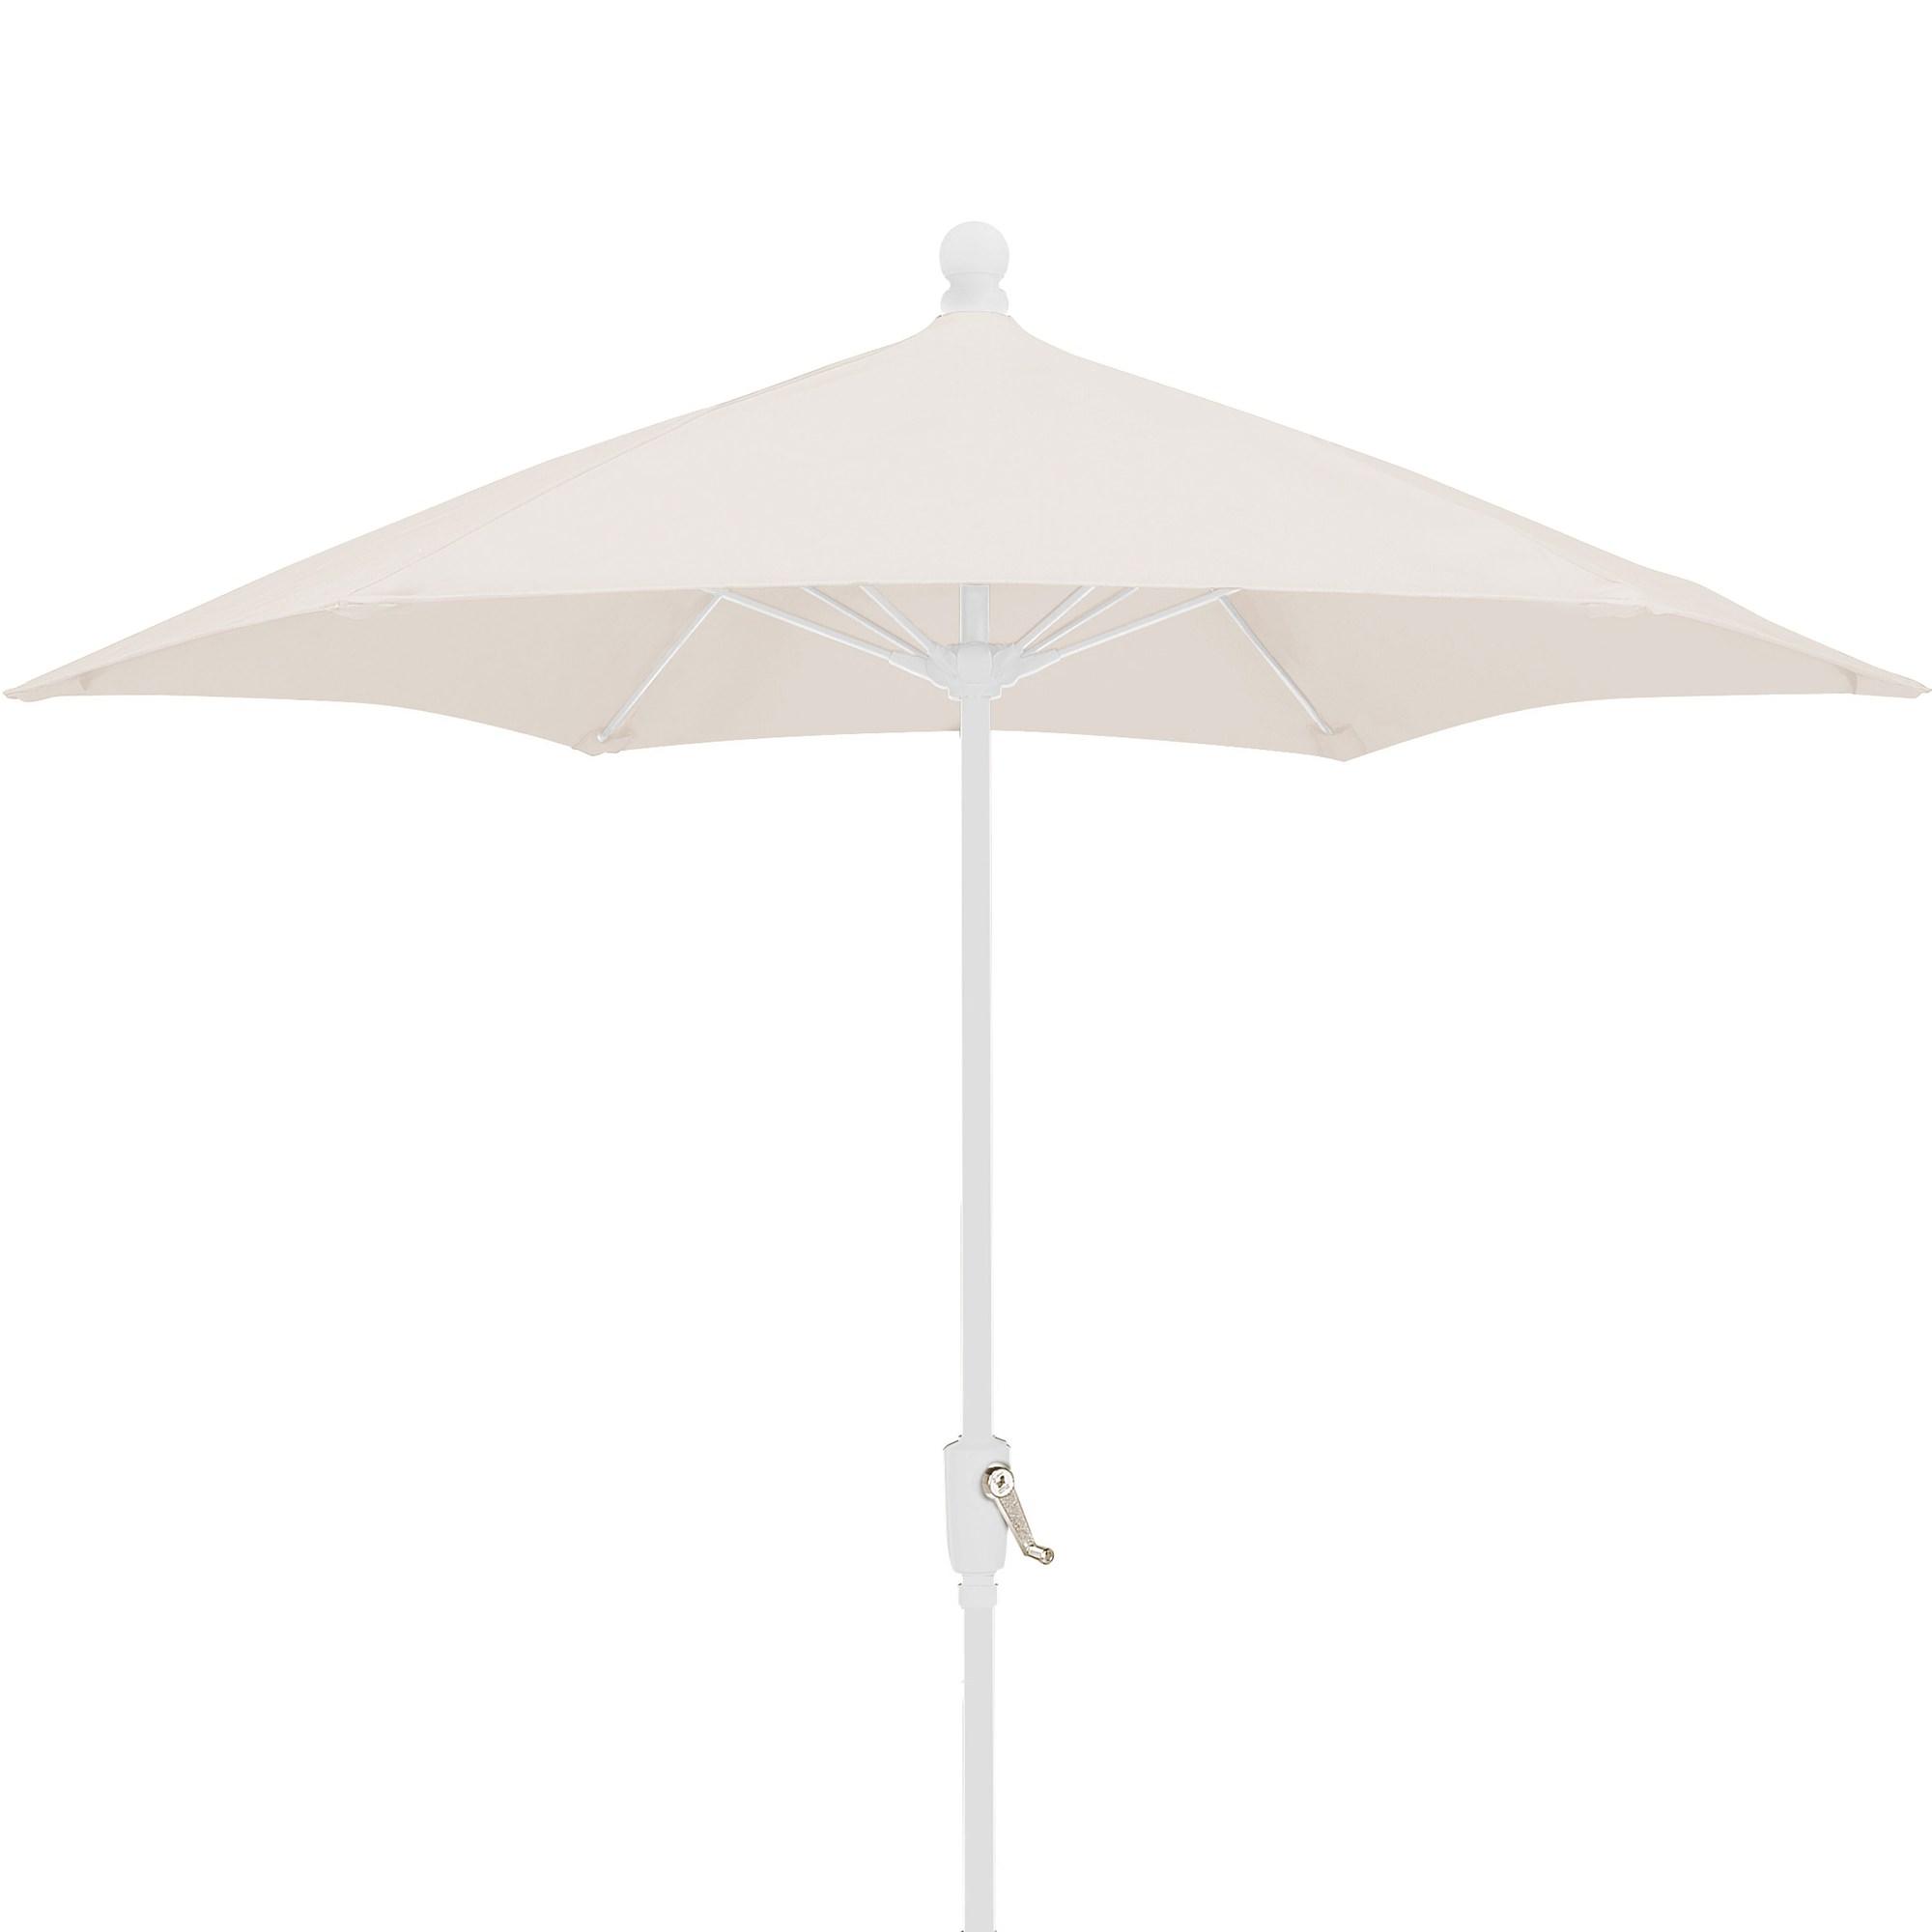 7 5 Ft Crank Lift Patio Umbrella With White Pole